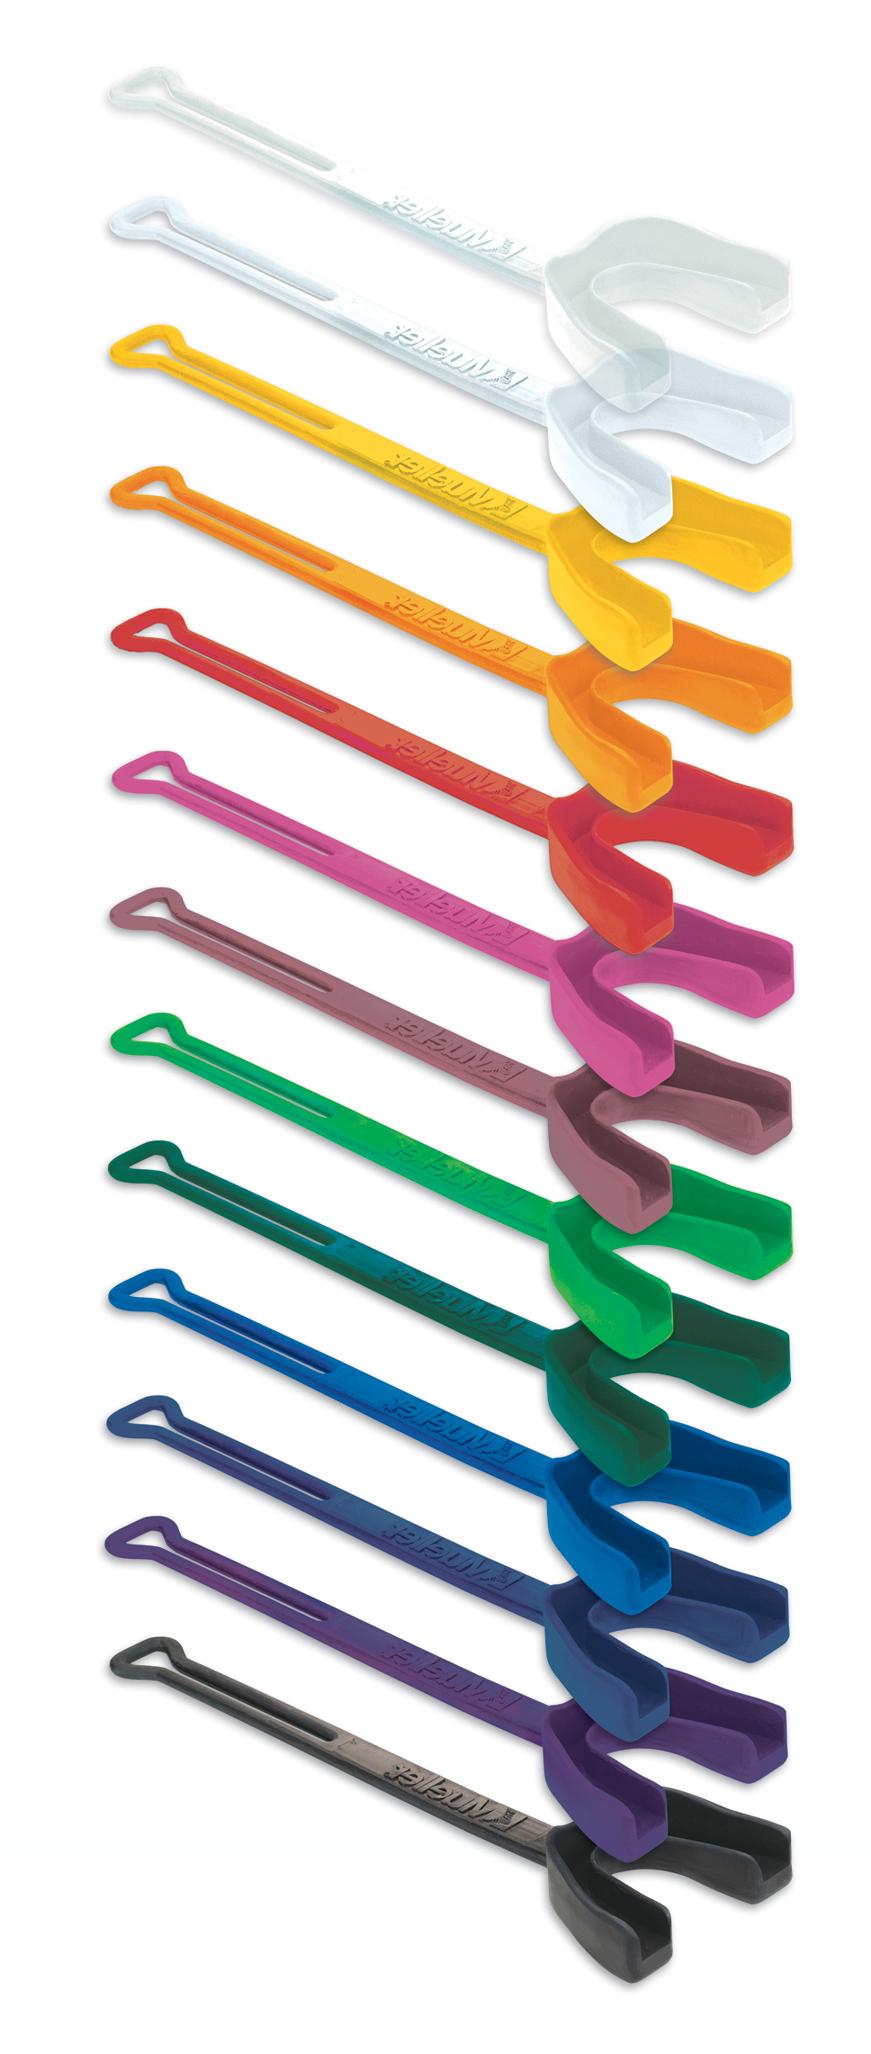 muellerguard-w-o-strap-orange-131045-74676131450-lr-2.jpg